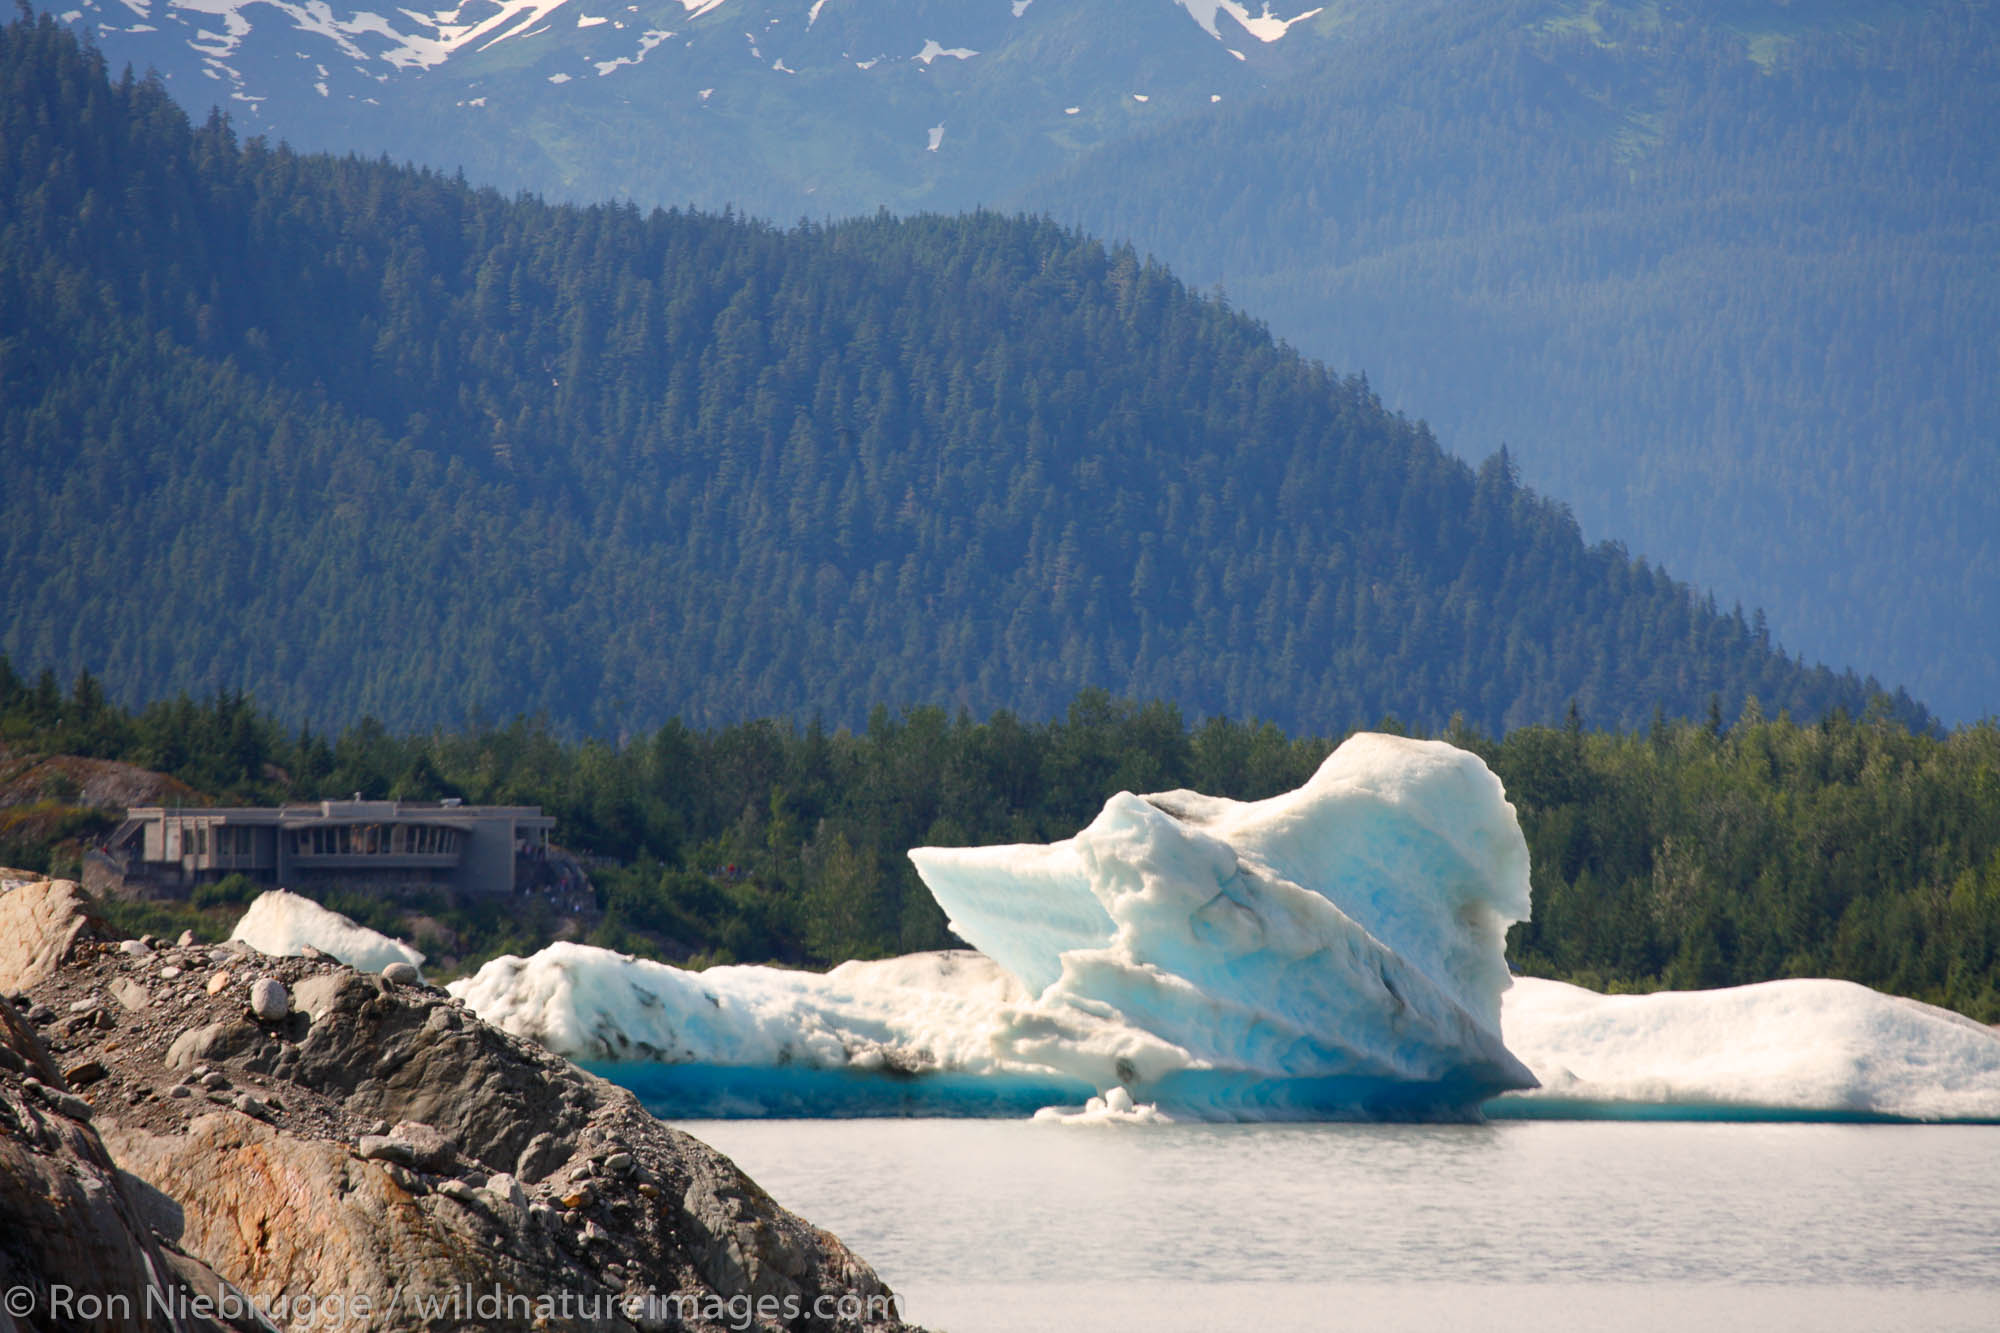 Mendenhall Glacier and lake, Juneau, Alaska.